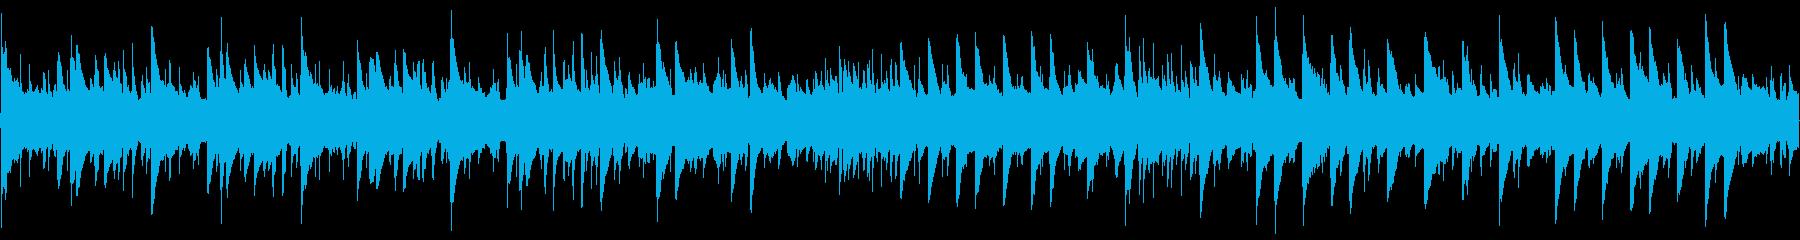 8bit ファンタジーな冒険の旅 ループの再生済みの波形